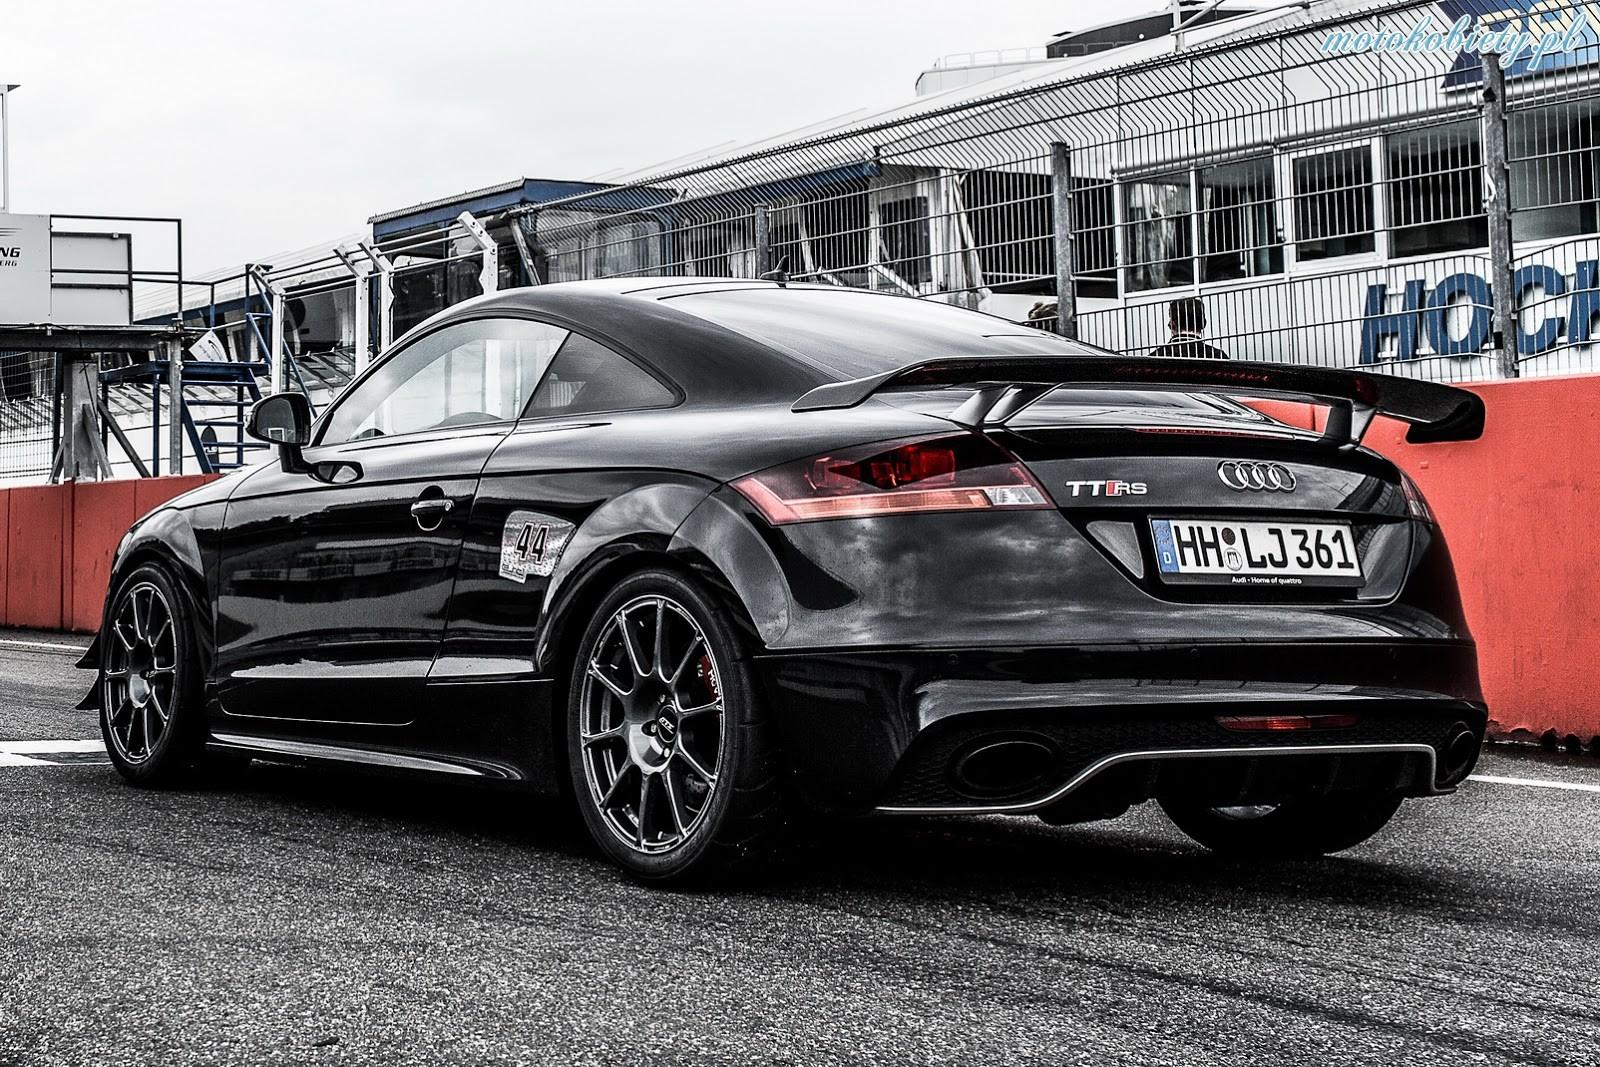 Audi TT RS Clubsport HPerformance